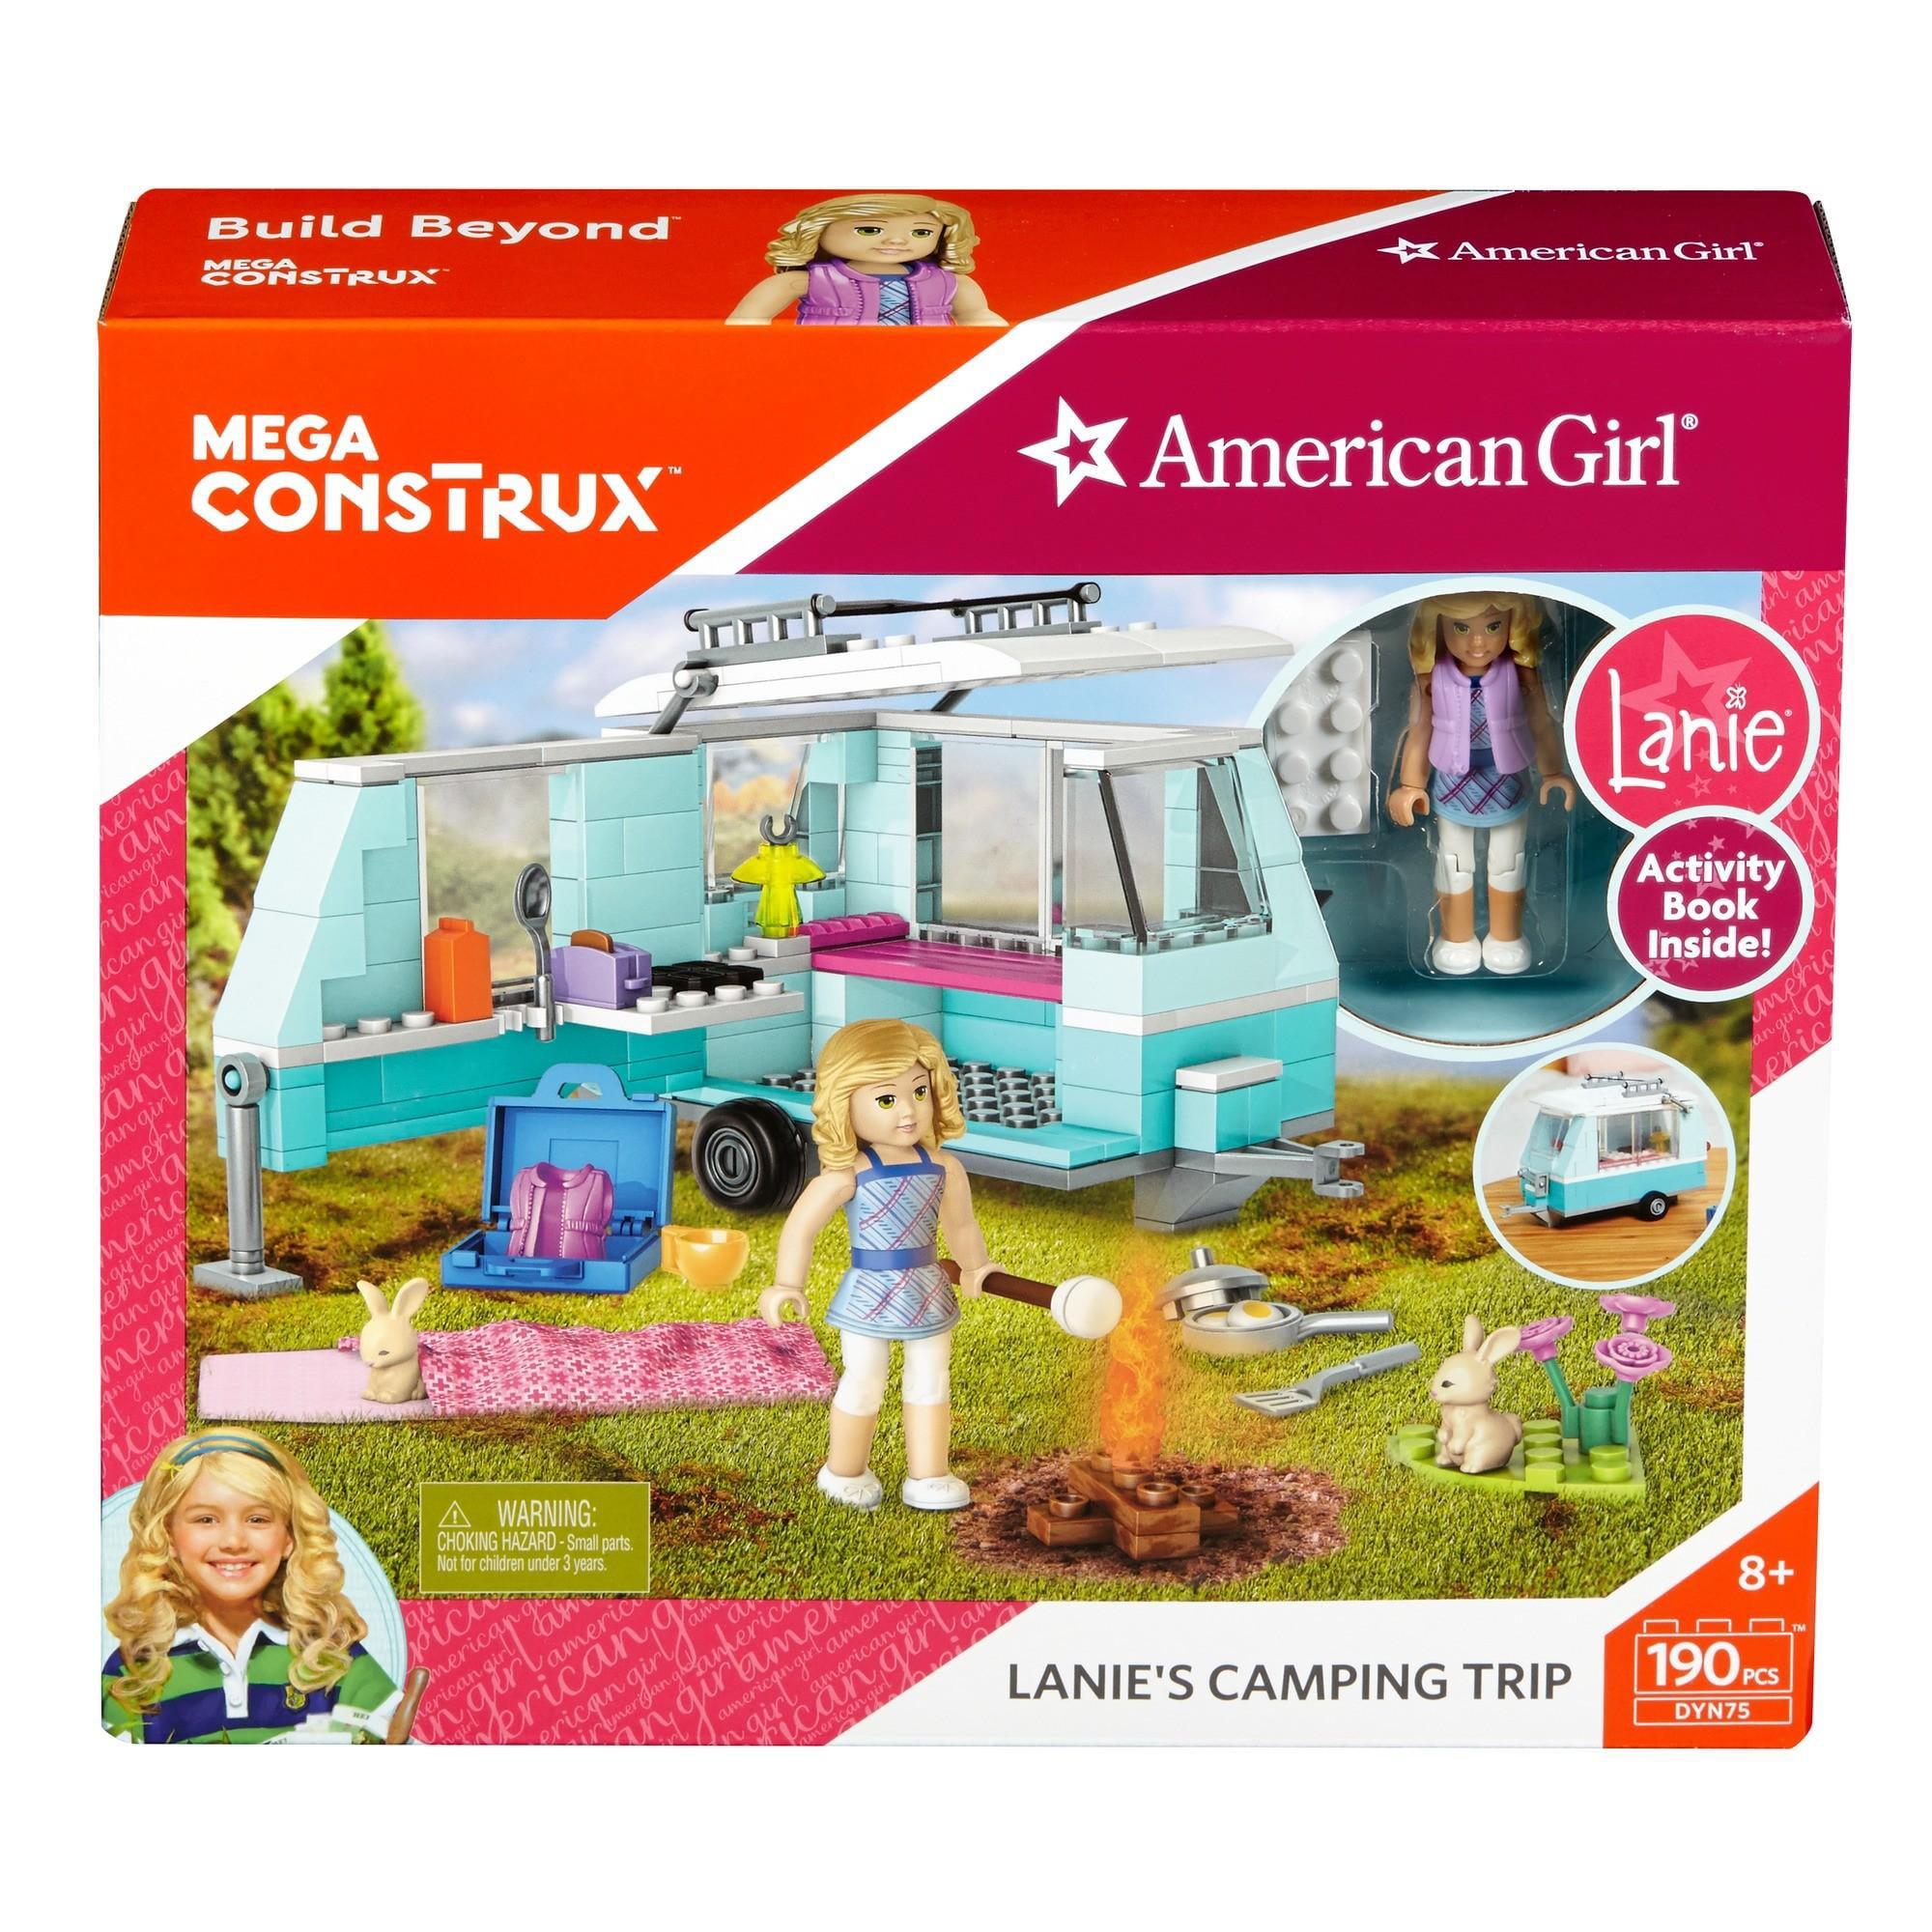 Mega Construx American Girl Lanie's Camper Building Set by MATTEL INC.